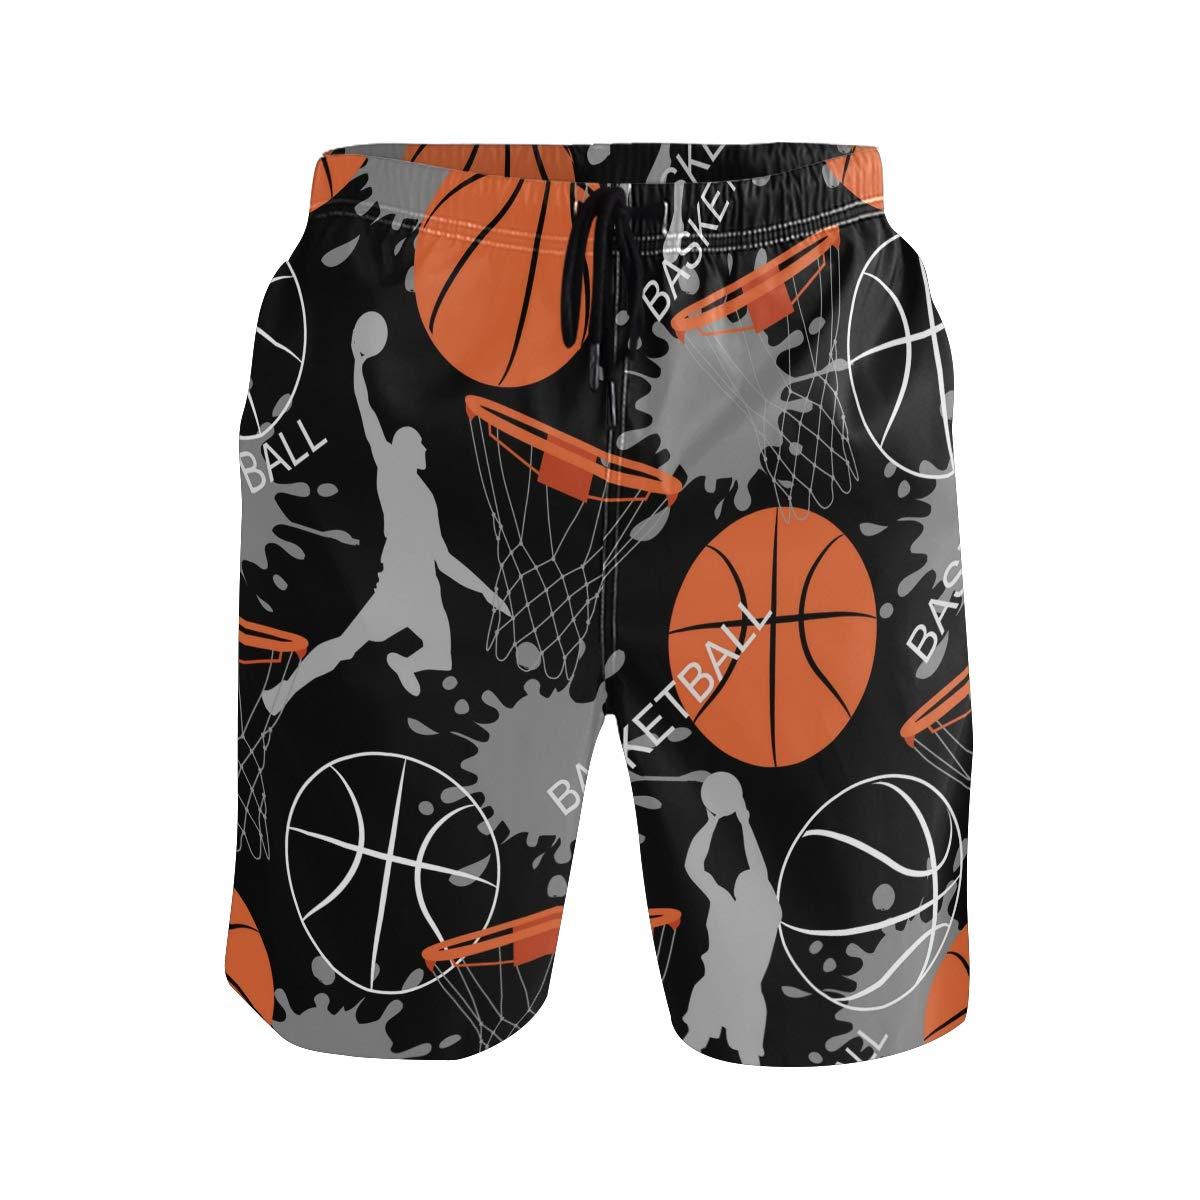 KUWT Mens Swim Trunks Sport Man Basketball Quick Dry Beach Shorts Summer Surf Board Shorts